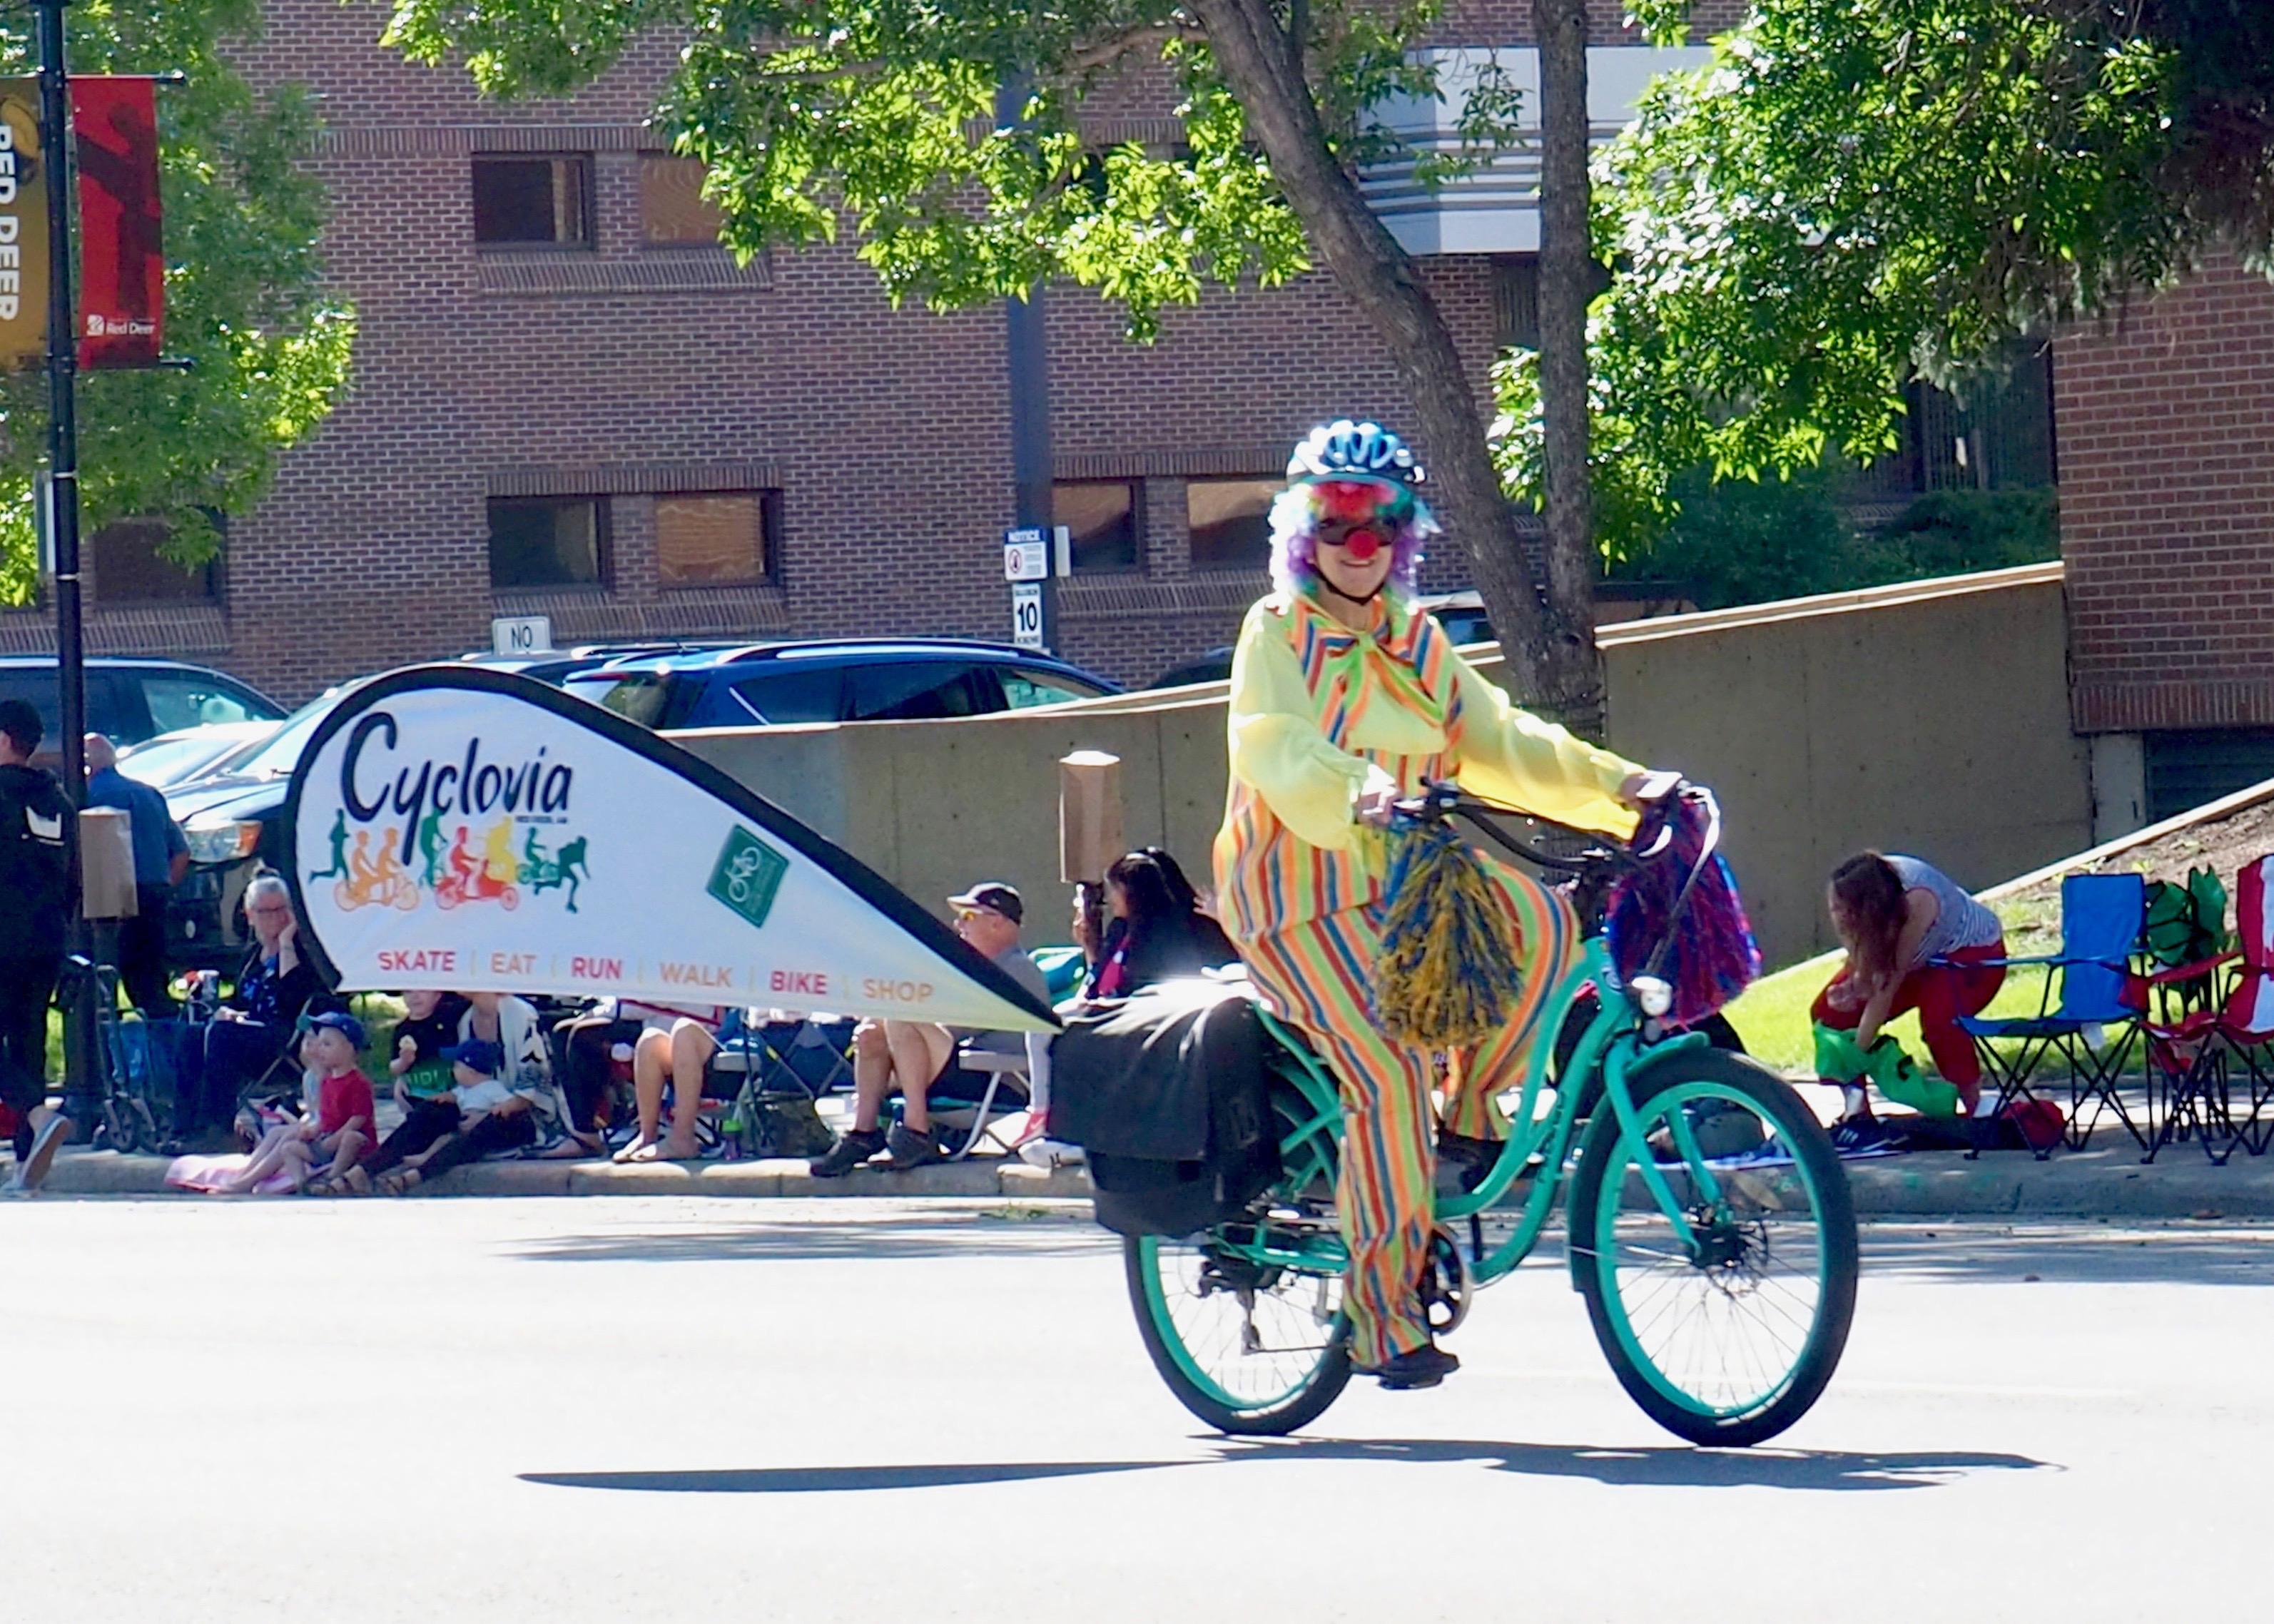 Cyclovia 2019 in the Westerner Parade